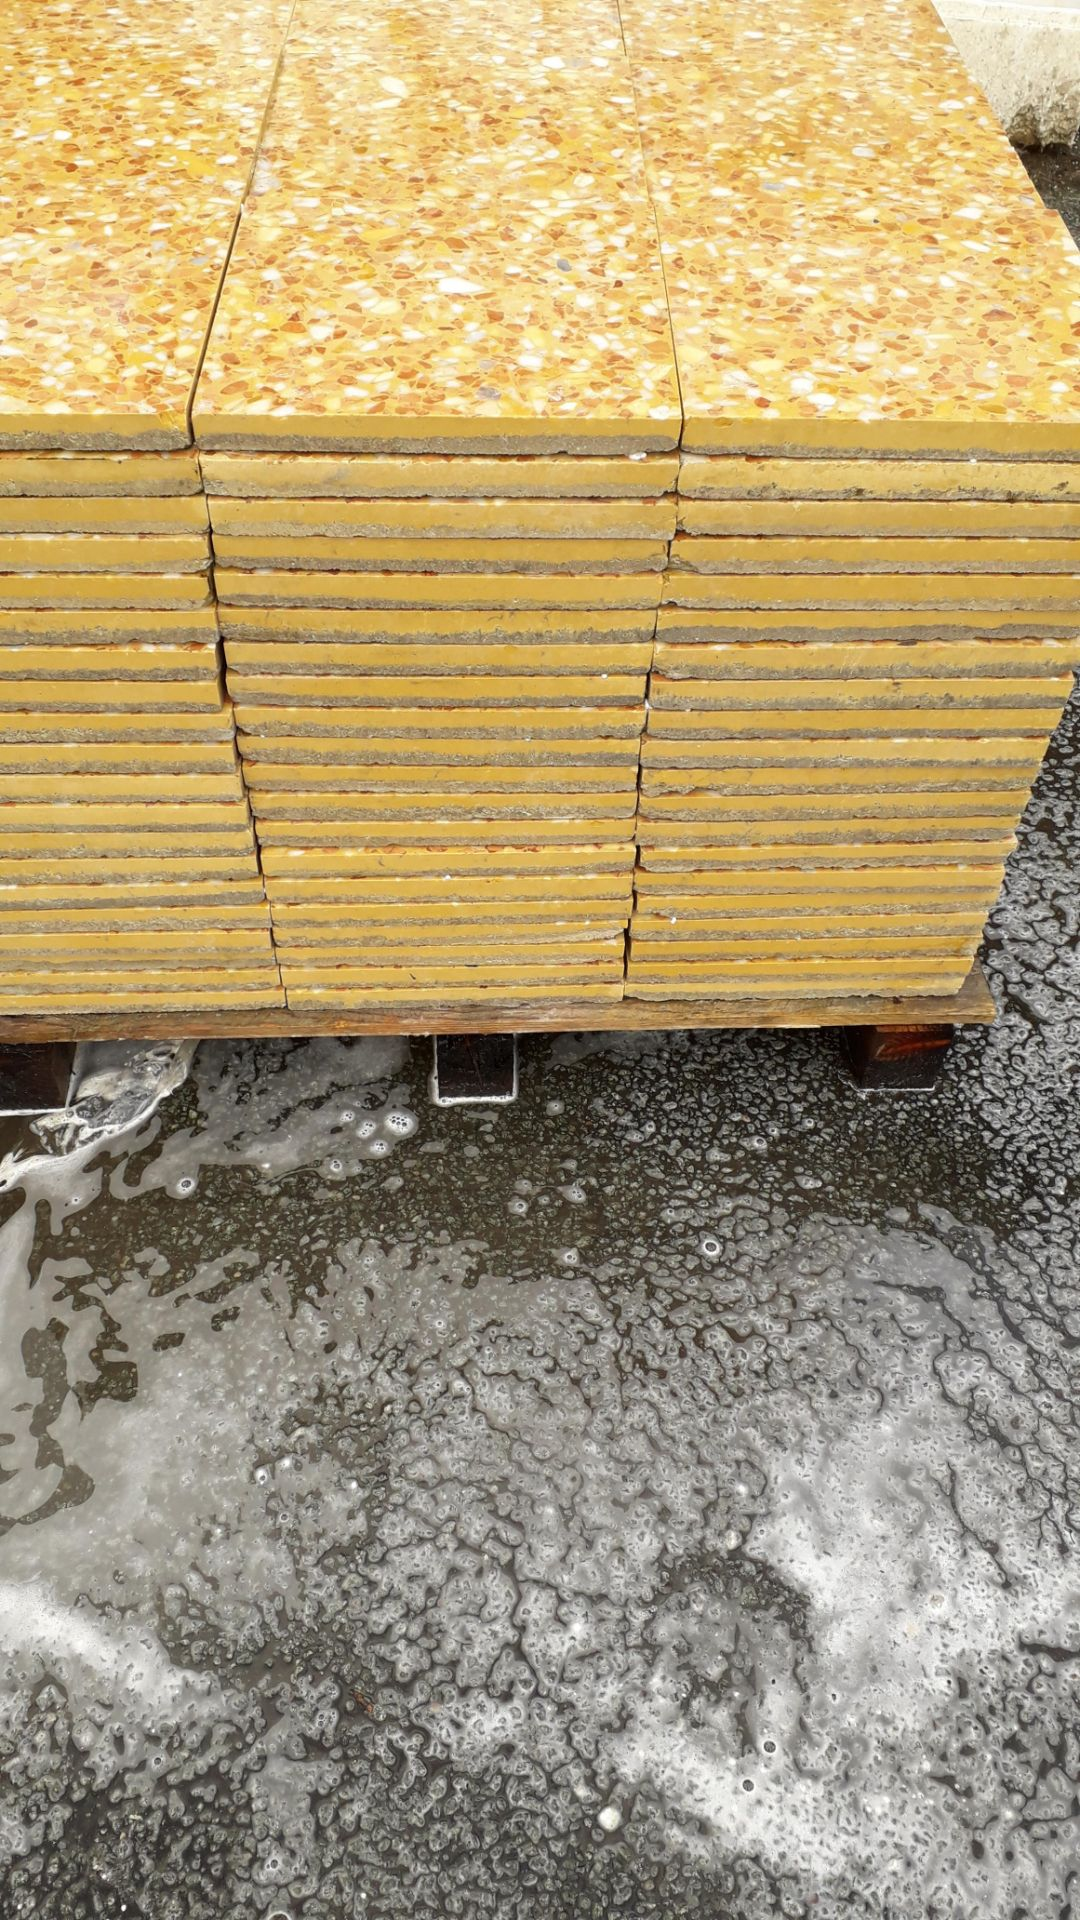 Lot 20 - 1 x pallet (L 07802) Commercial Floor Tiles - Total coverage 20 square yards